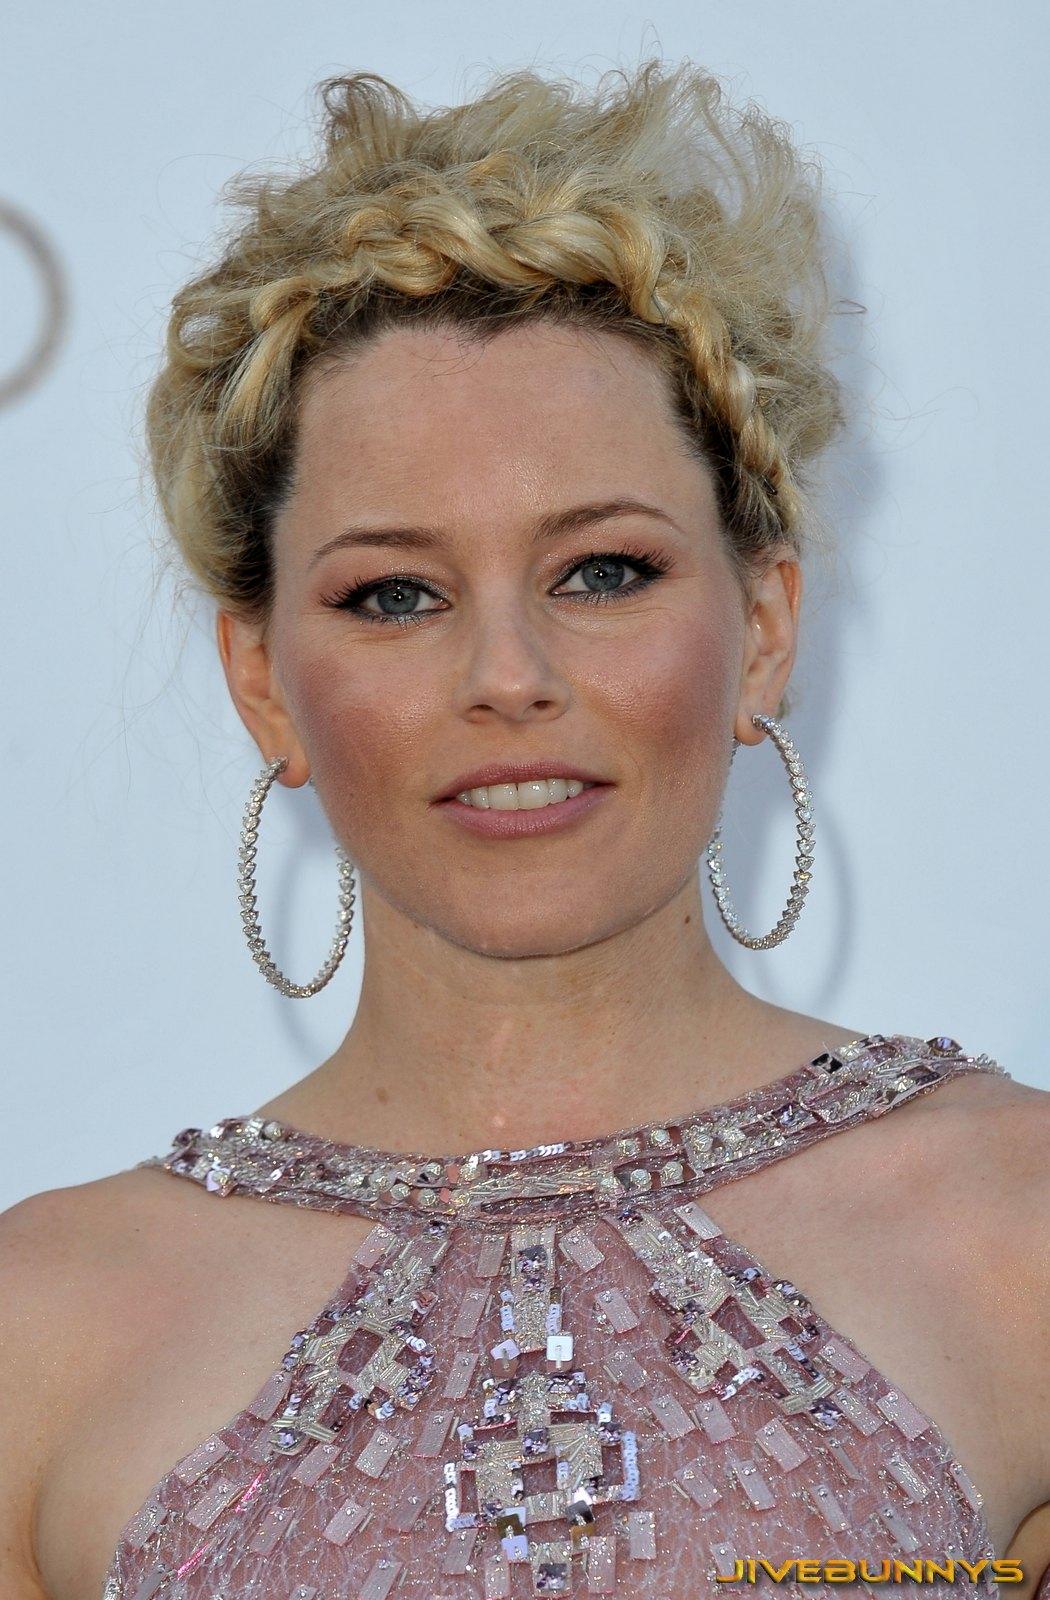 http://4.bp.blogspot.com/-9Wop28UTveI/T3homzvZNFI/AAAAAAAAED4/NwhPKHxOsQU/s1600/elizabeth-banks-actress-celebrity-101700.jpg